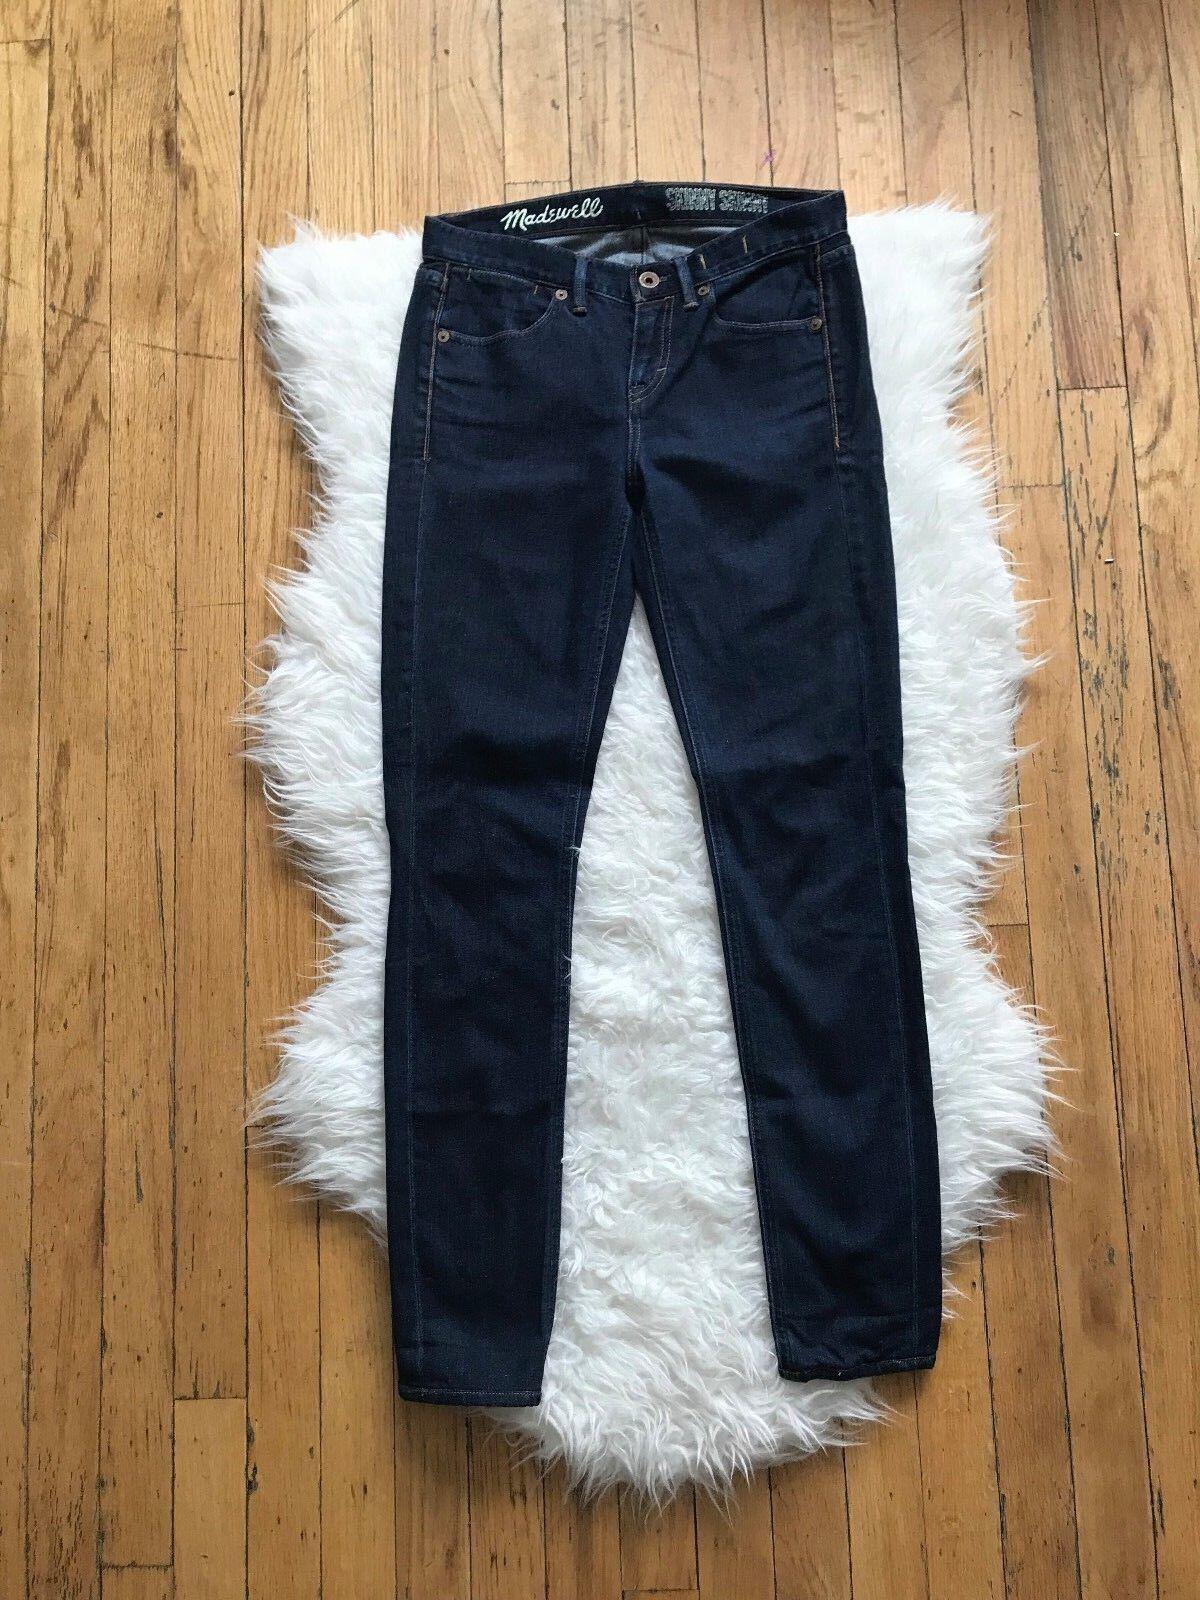 Madewell J.Crew 20.3cm Mid-Rise Skinny Hautenge Jeans  Dunkelblau Wash 25 X29